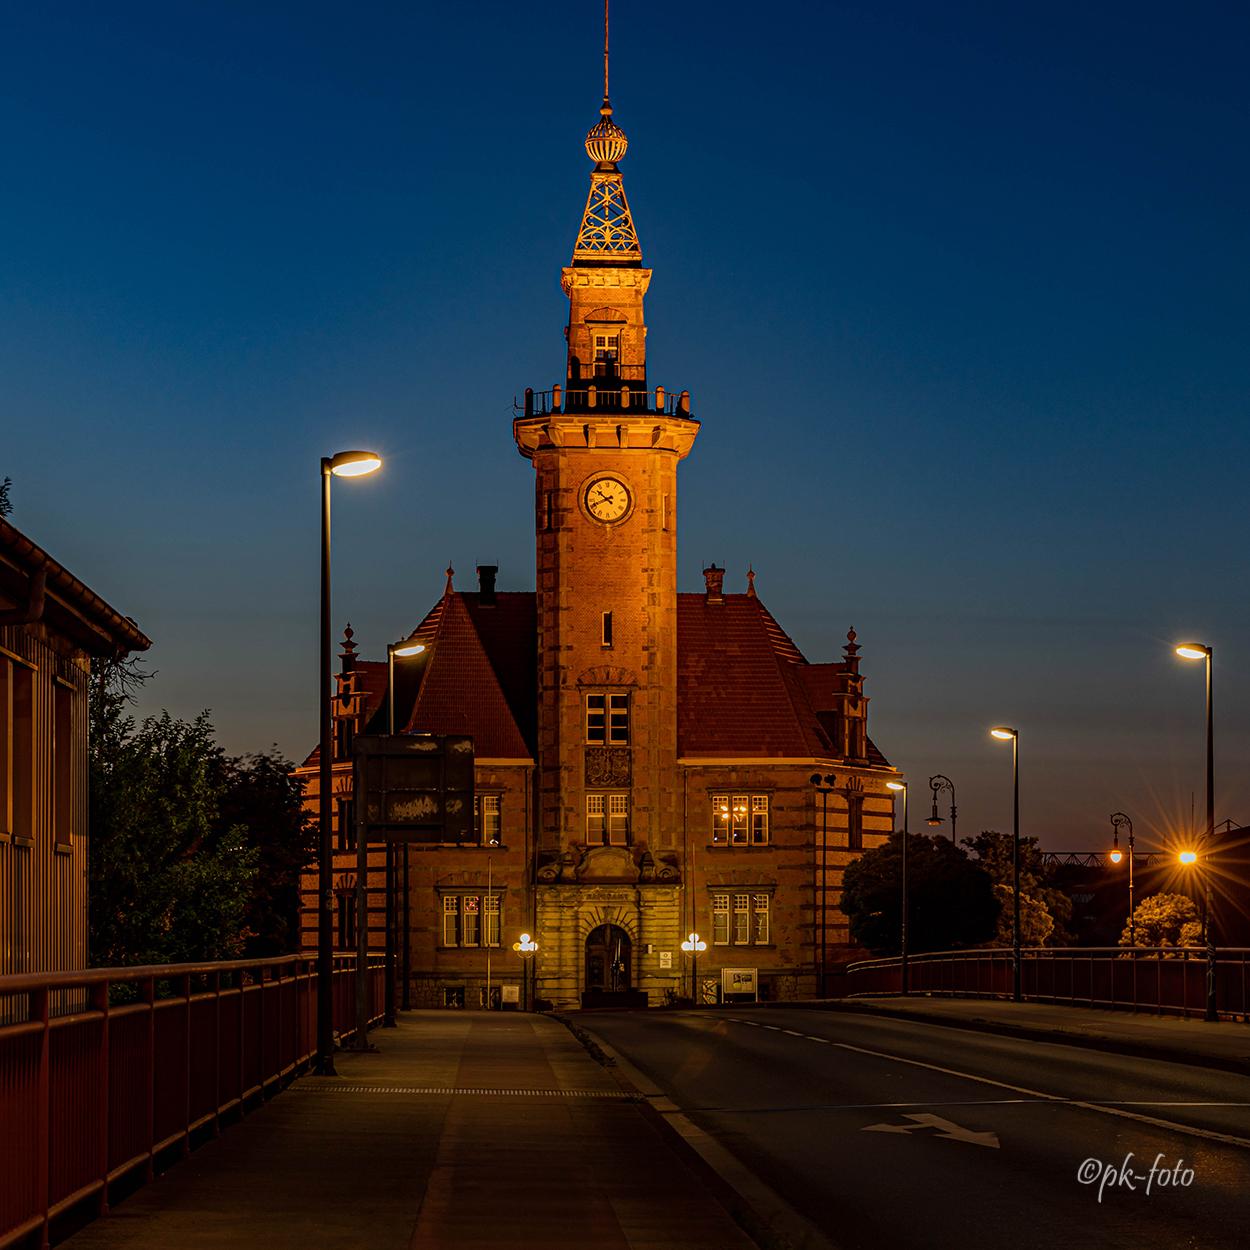 Alte Dortmunder Hafenamt